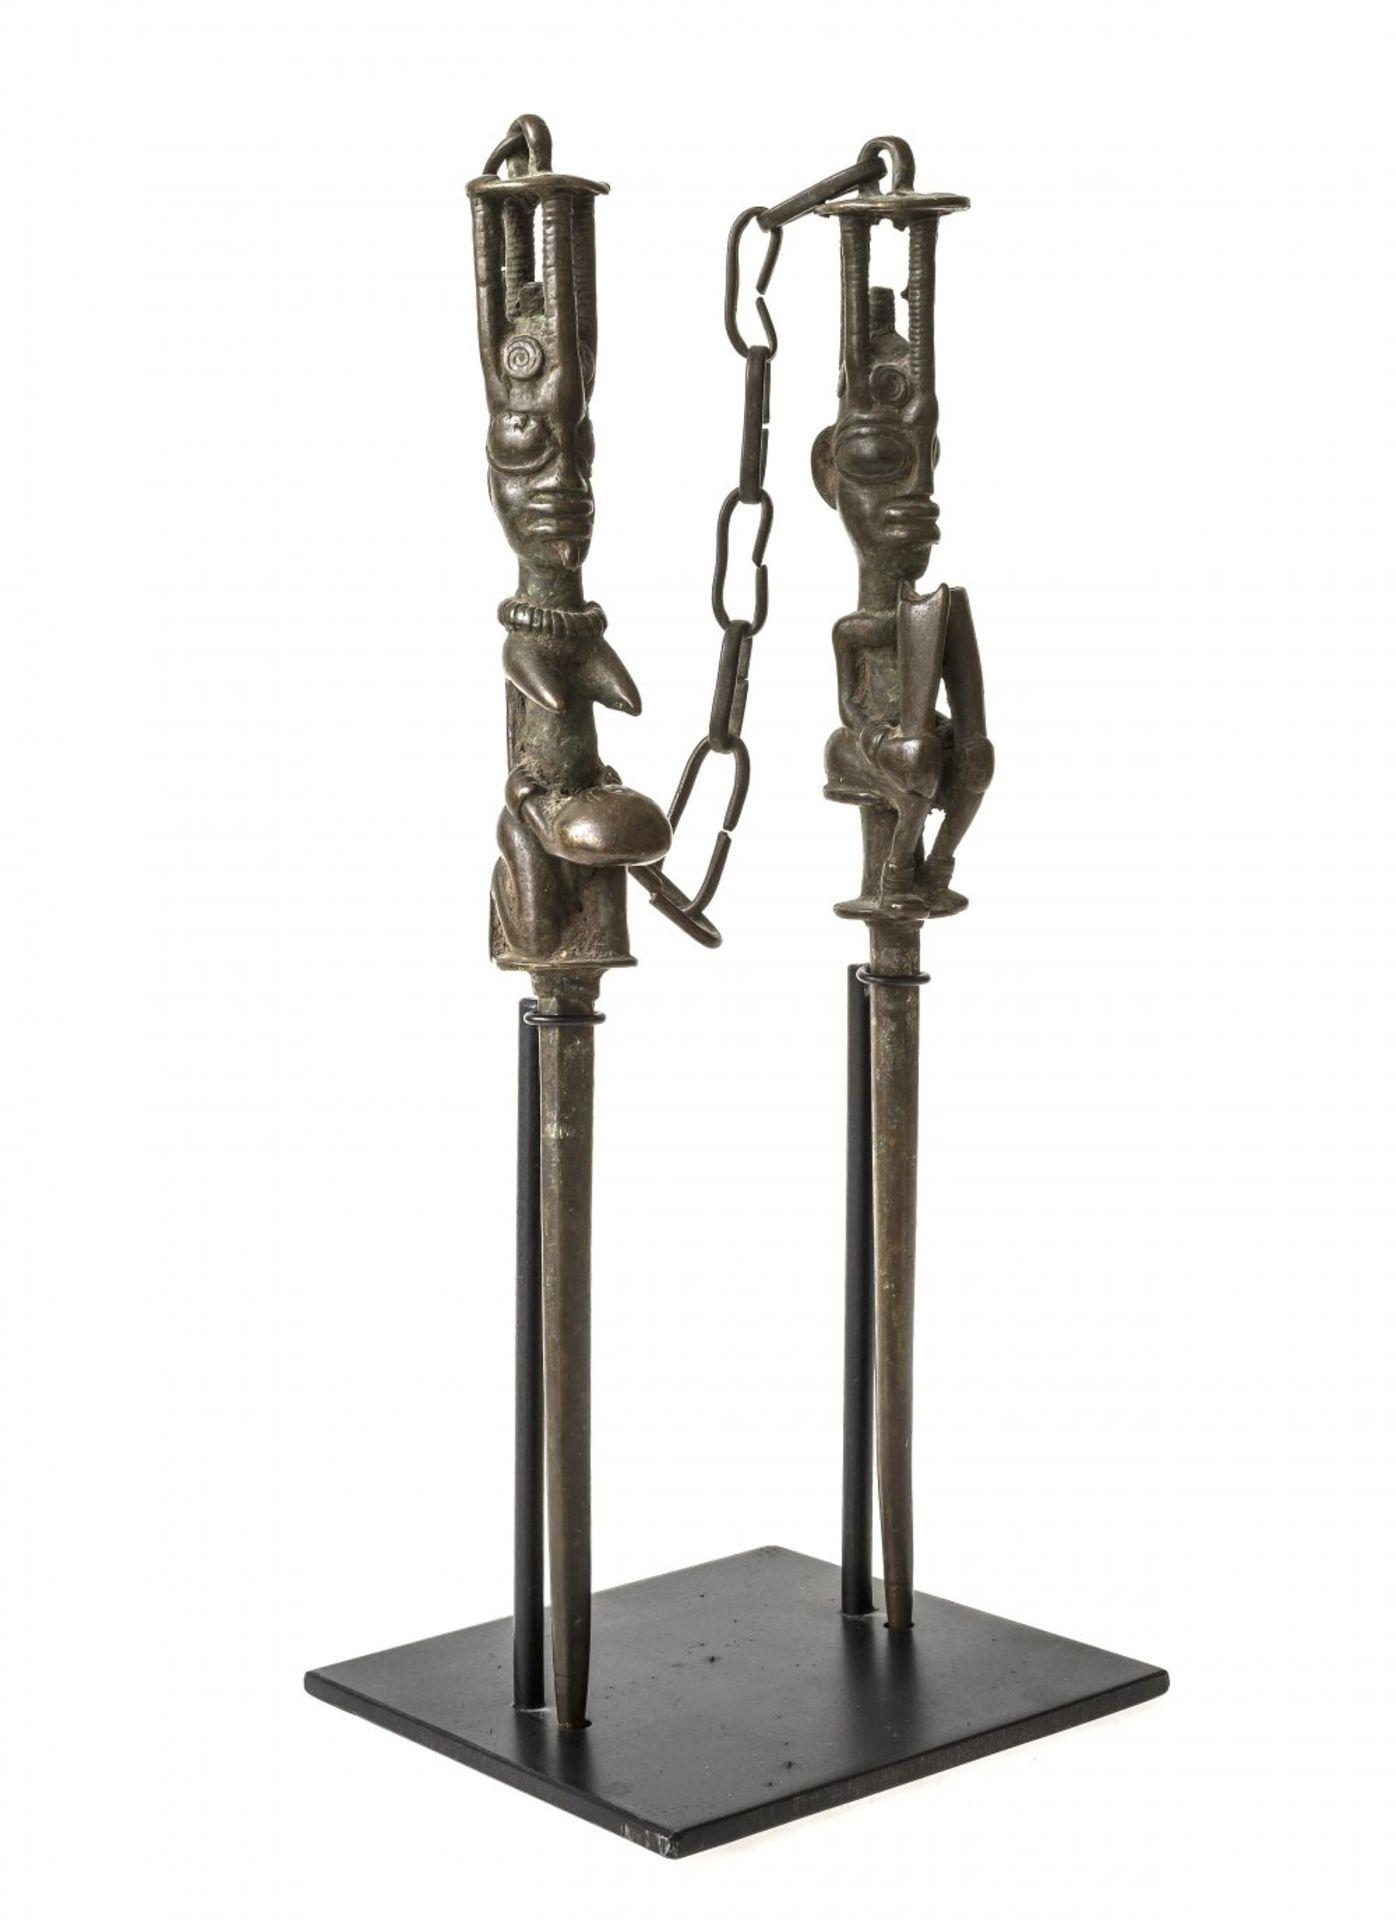 Los 196 - Figurenpaar der Yoruba. (Edan Stäbe).Bronze. H. je ca. 29 cm. Die aus Bronze gefertigten...